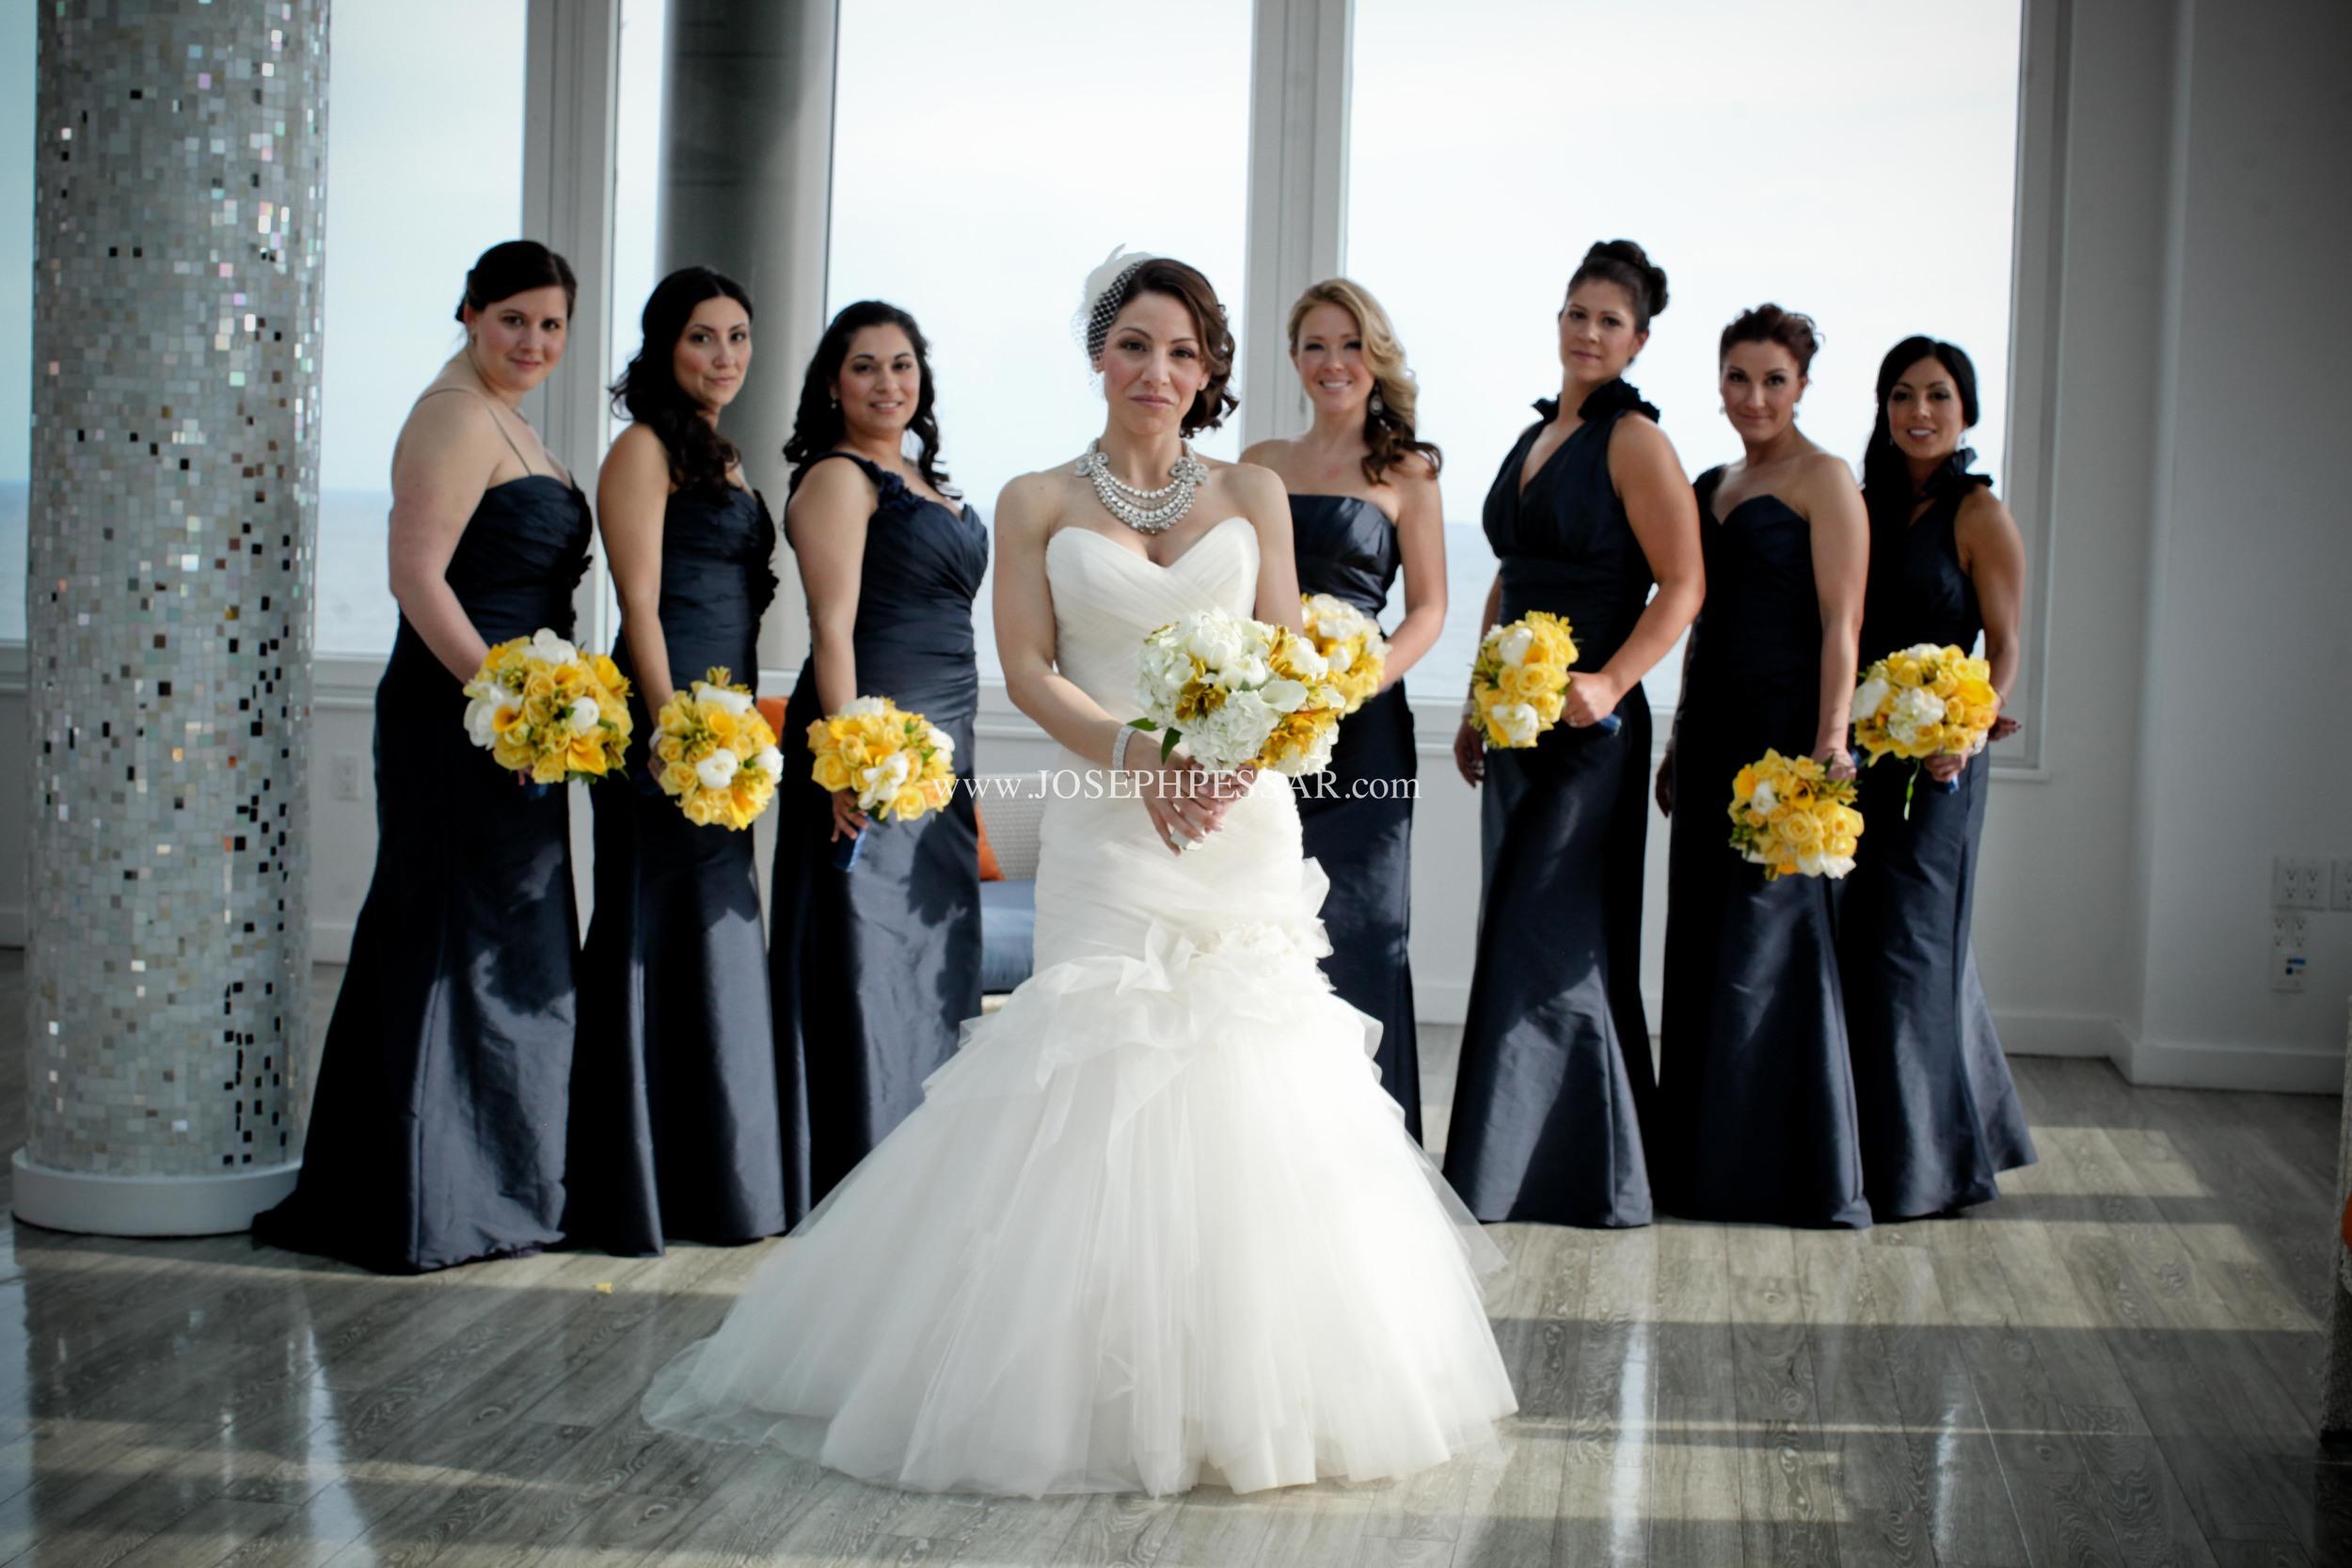 nyc_wedding_photographer0029.jpg